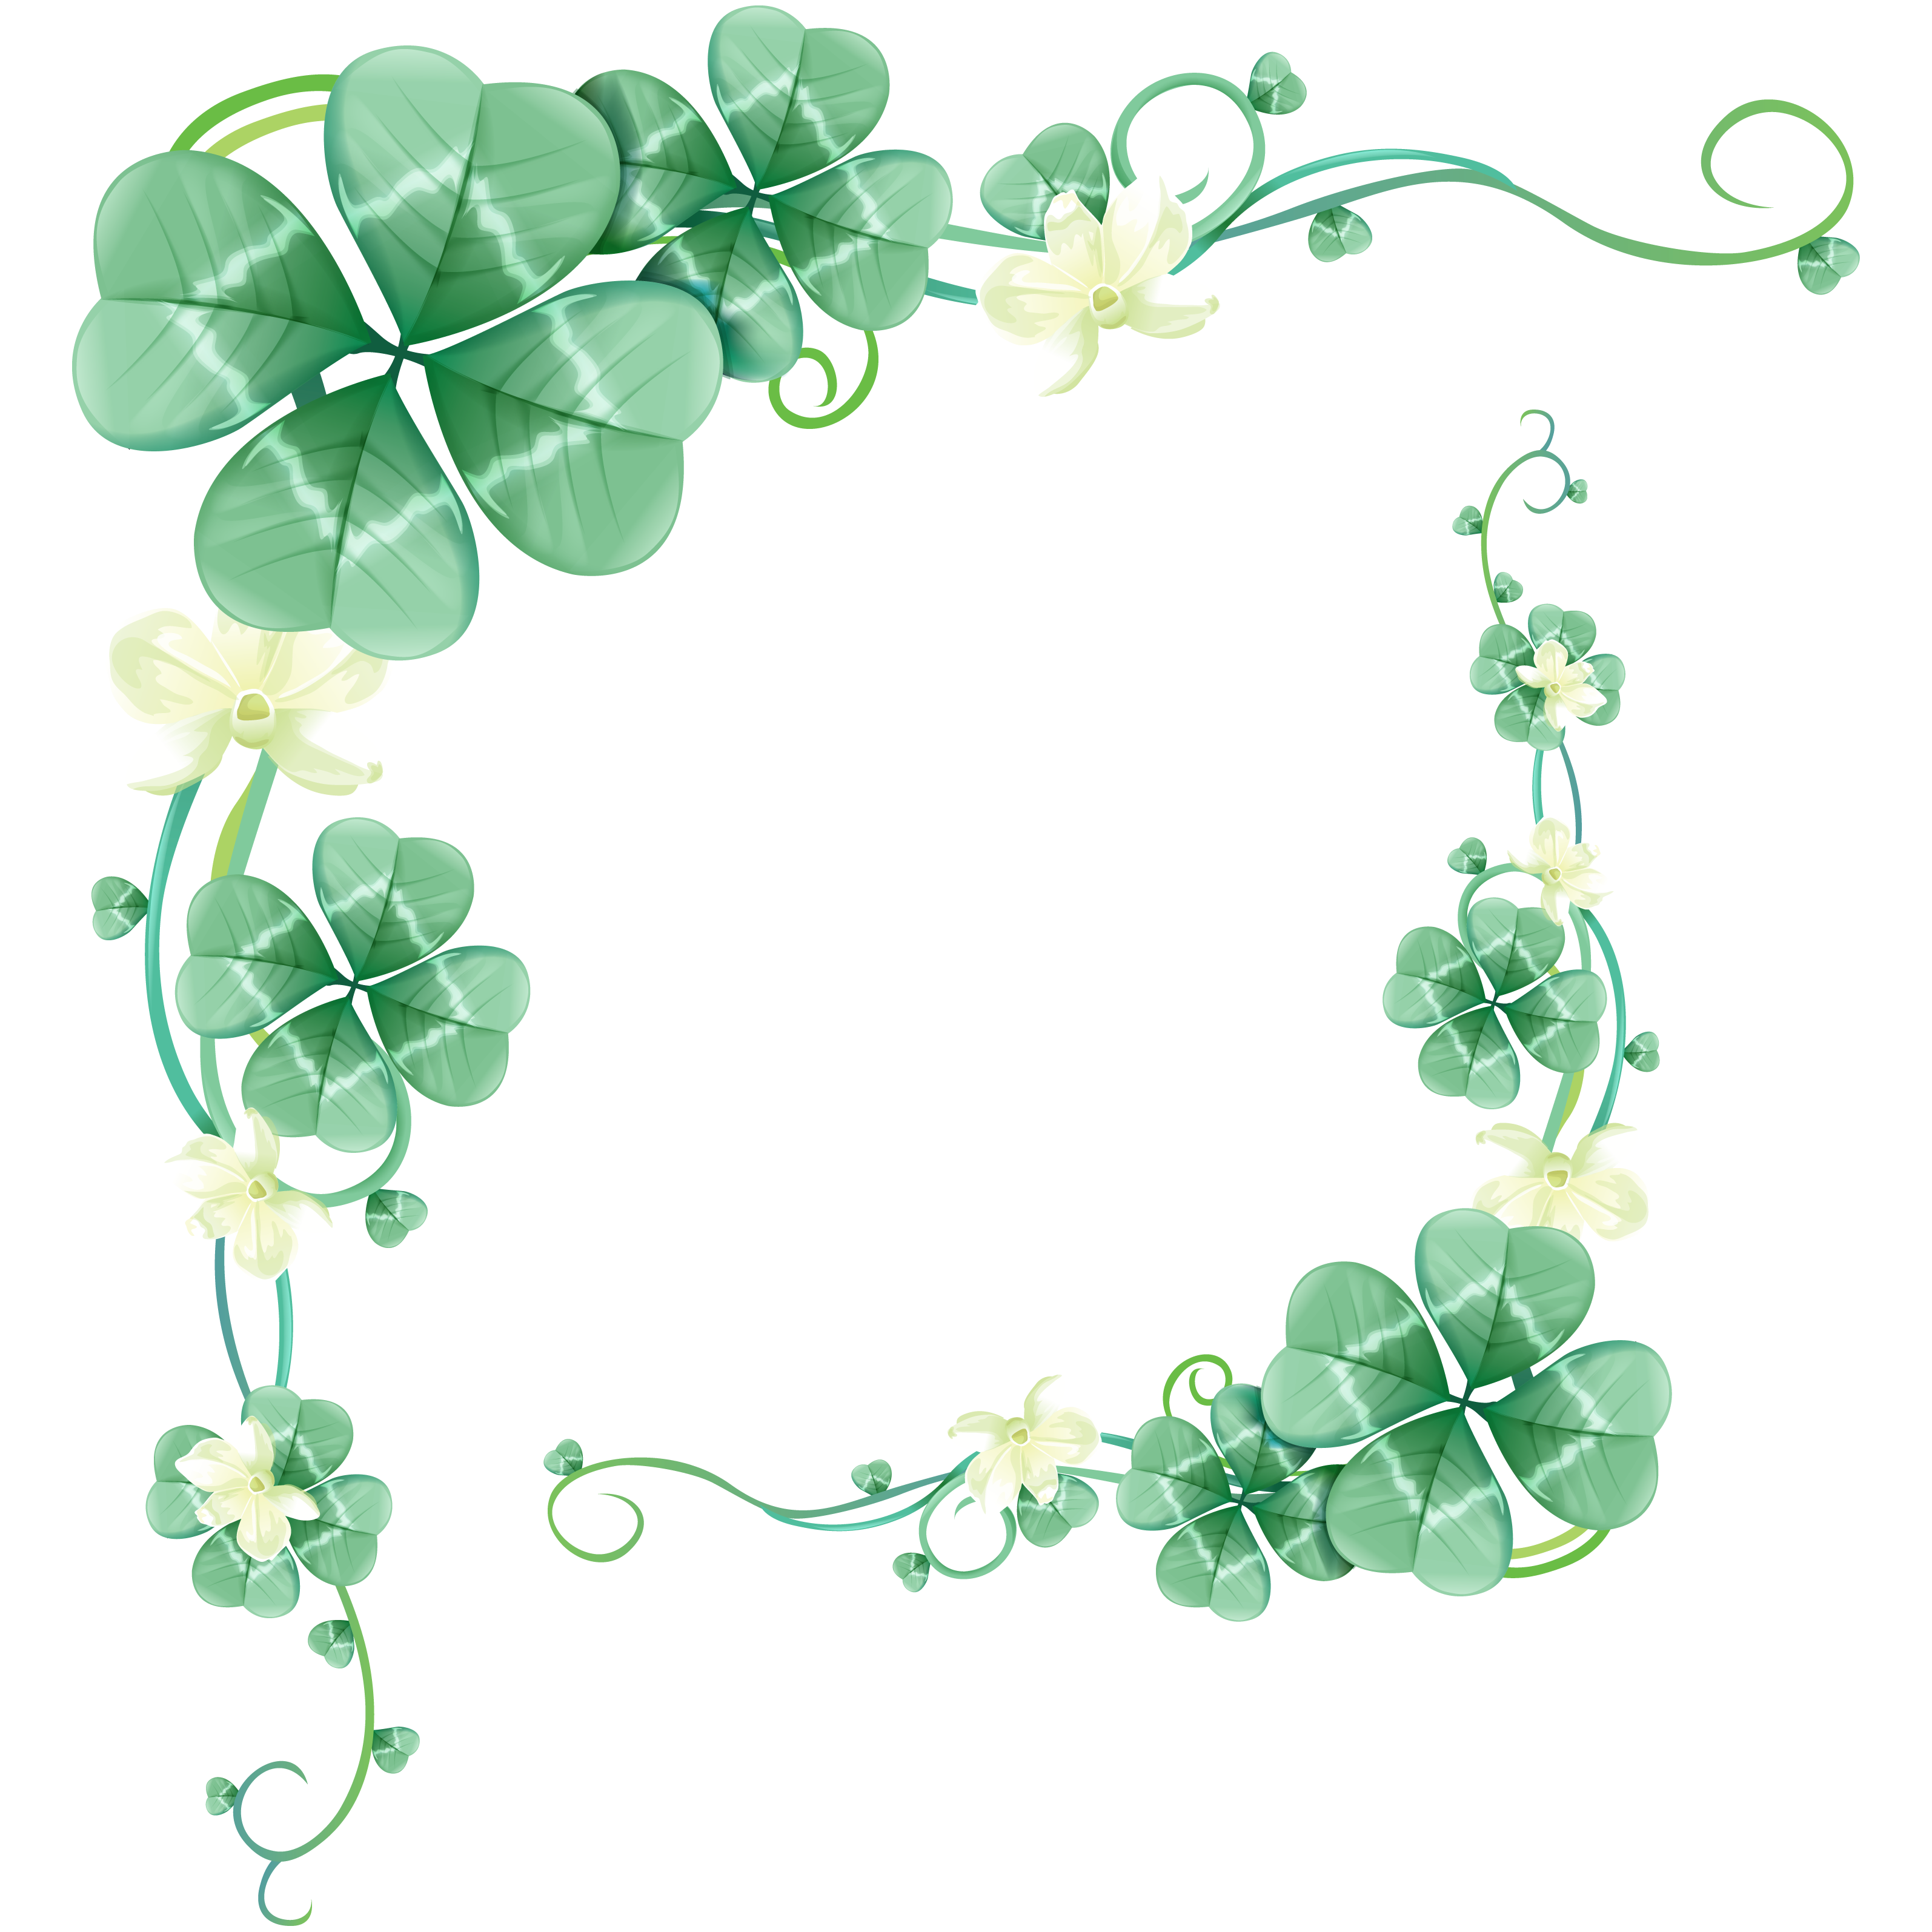 Clover clipart border. Four leaf green floral